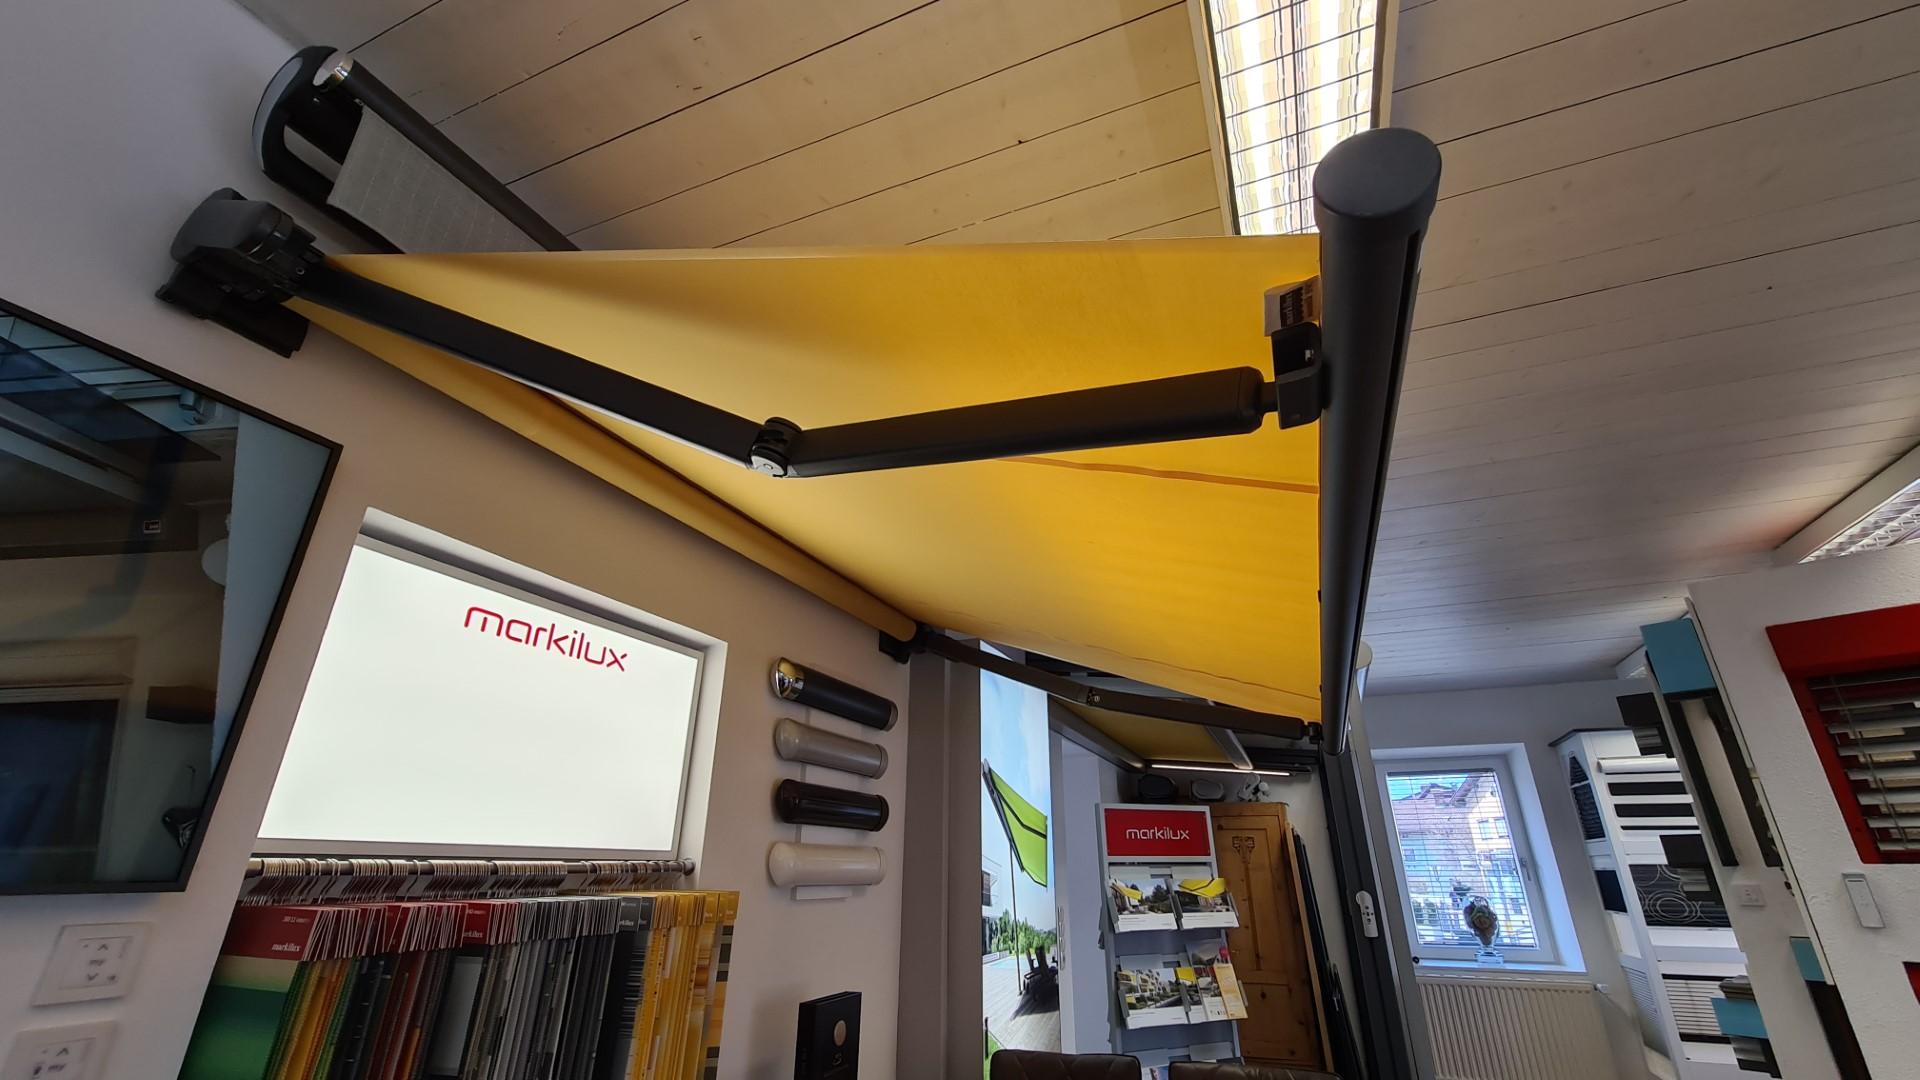 Pal Sonnenschutz, Markiux 930 - Aktion (2)